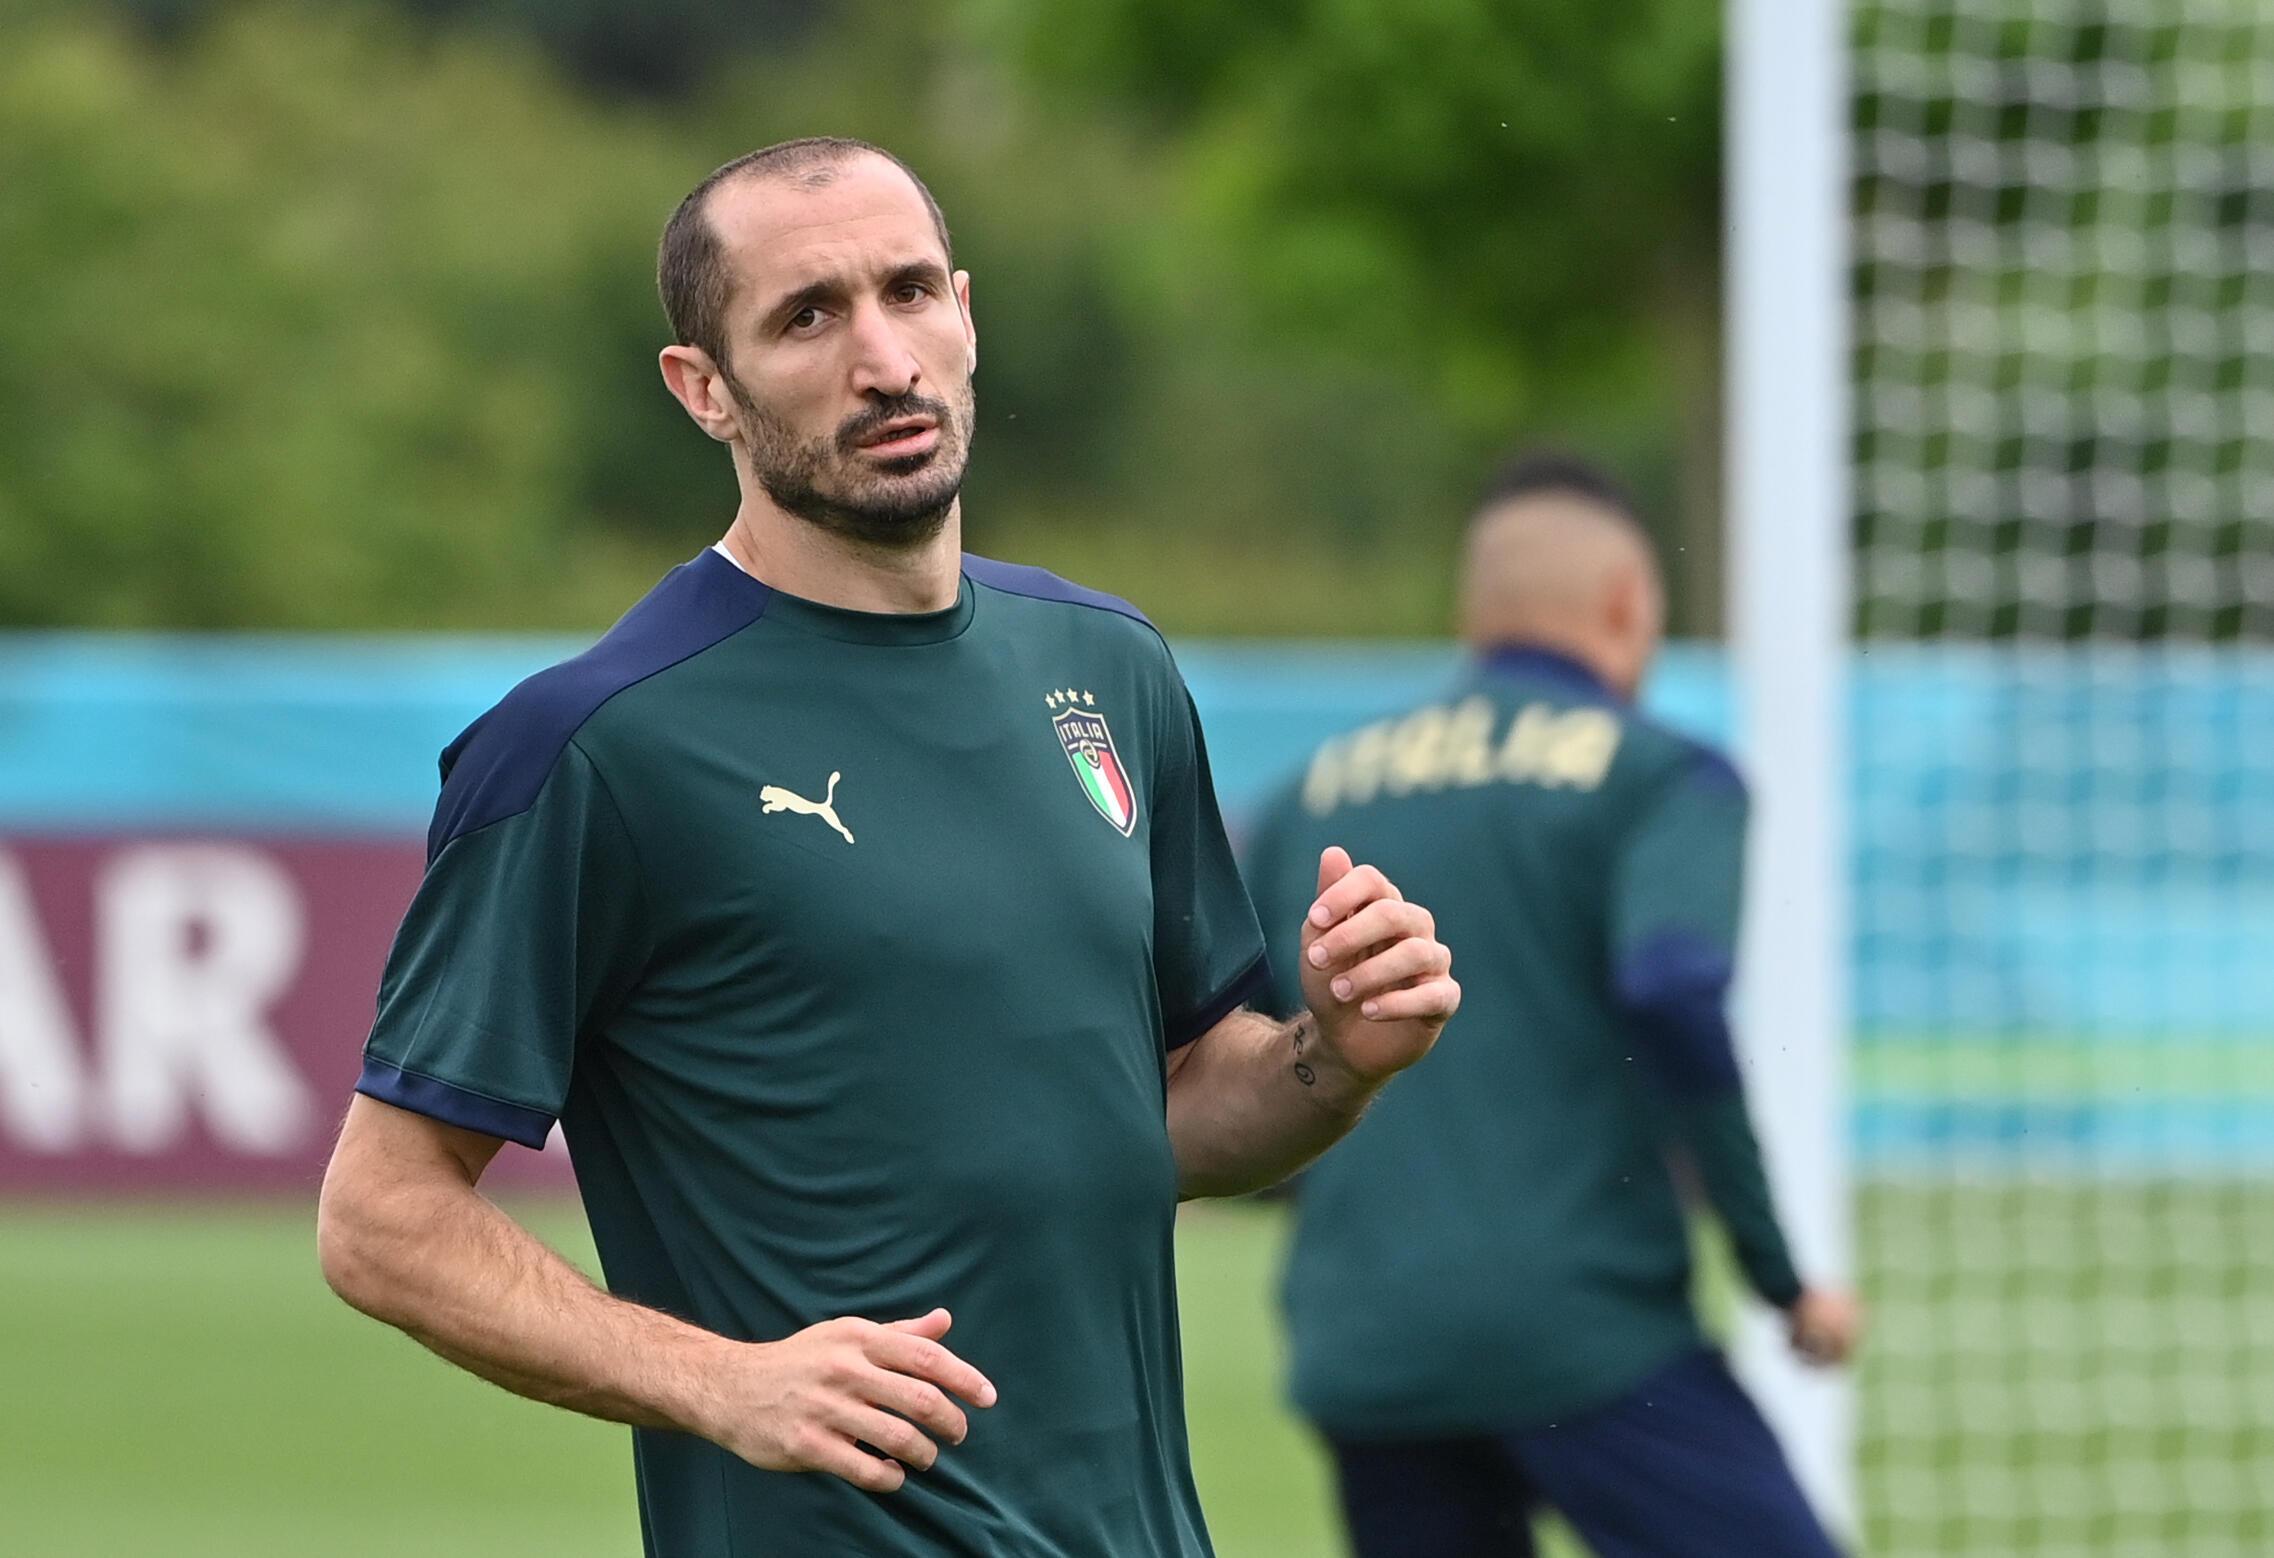 Giorgio Chiellini takes part in Italy's training session in London on Saturday